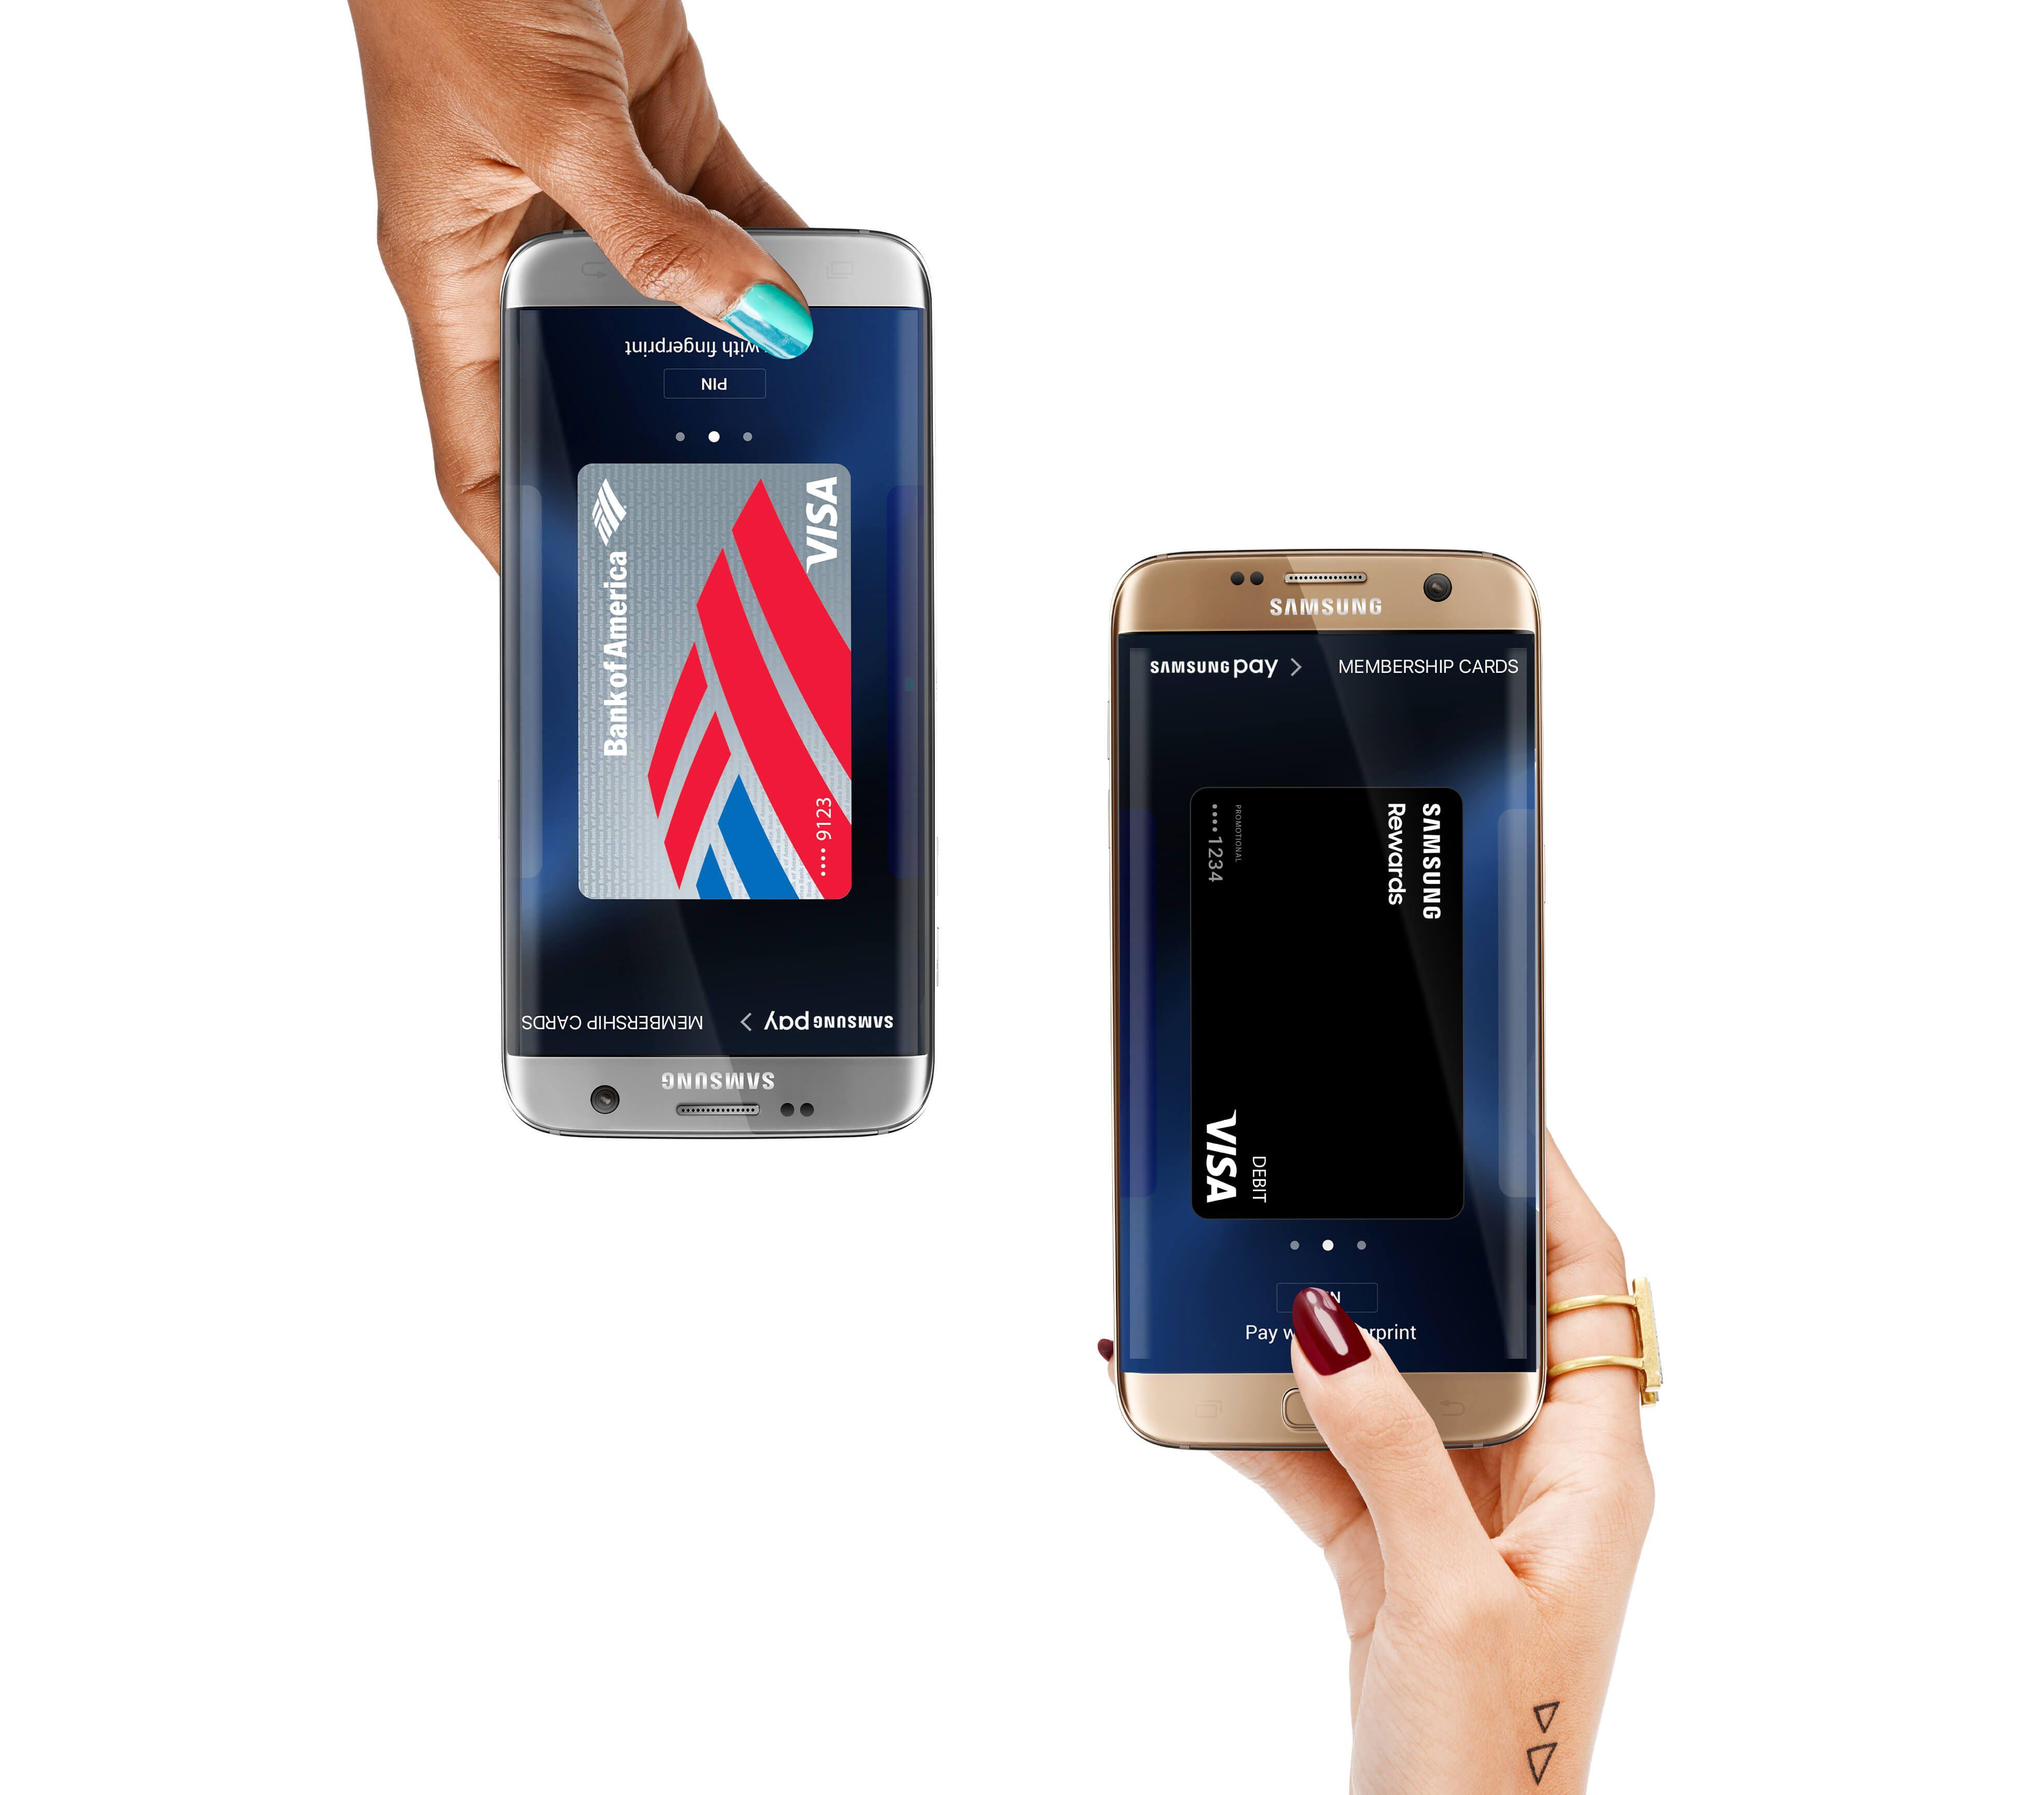 Samsung Pay Gets High Five Referral Rewards Digital